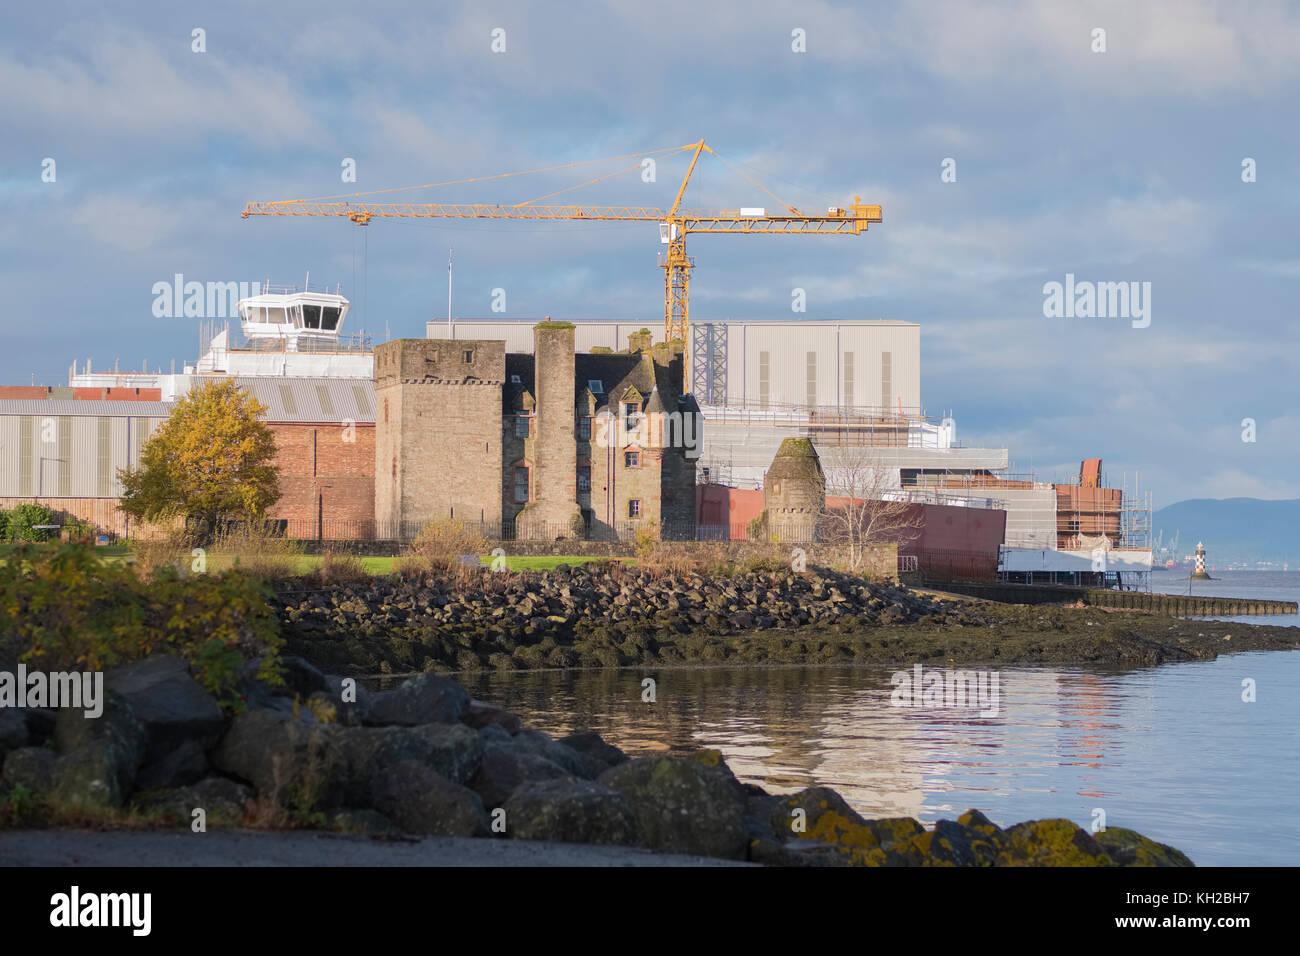 Newark Castle and Crane Shipbuilding Port Glasgow Inverclyde Scotland UK - Stock Image